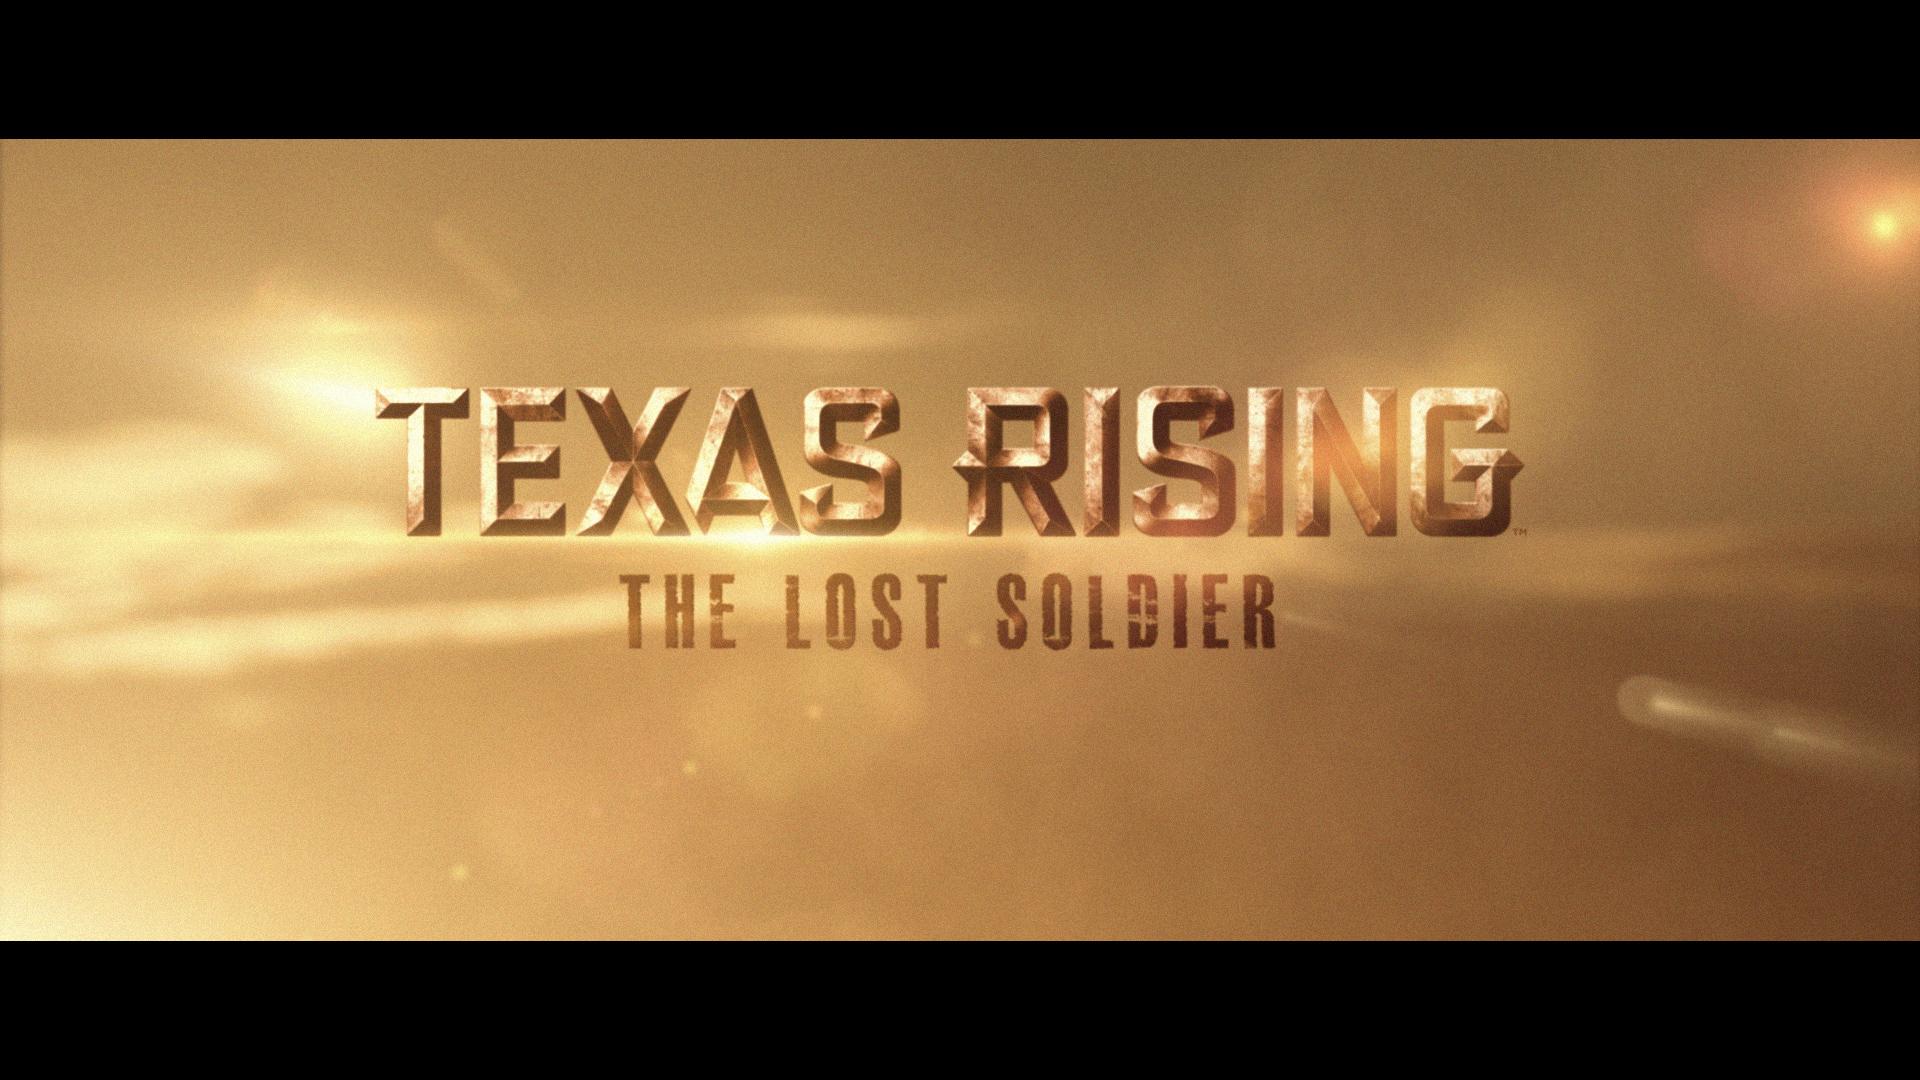 Texasrising2.jpg